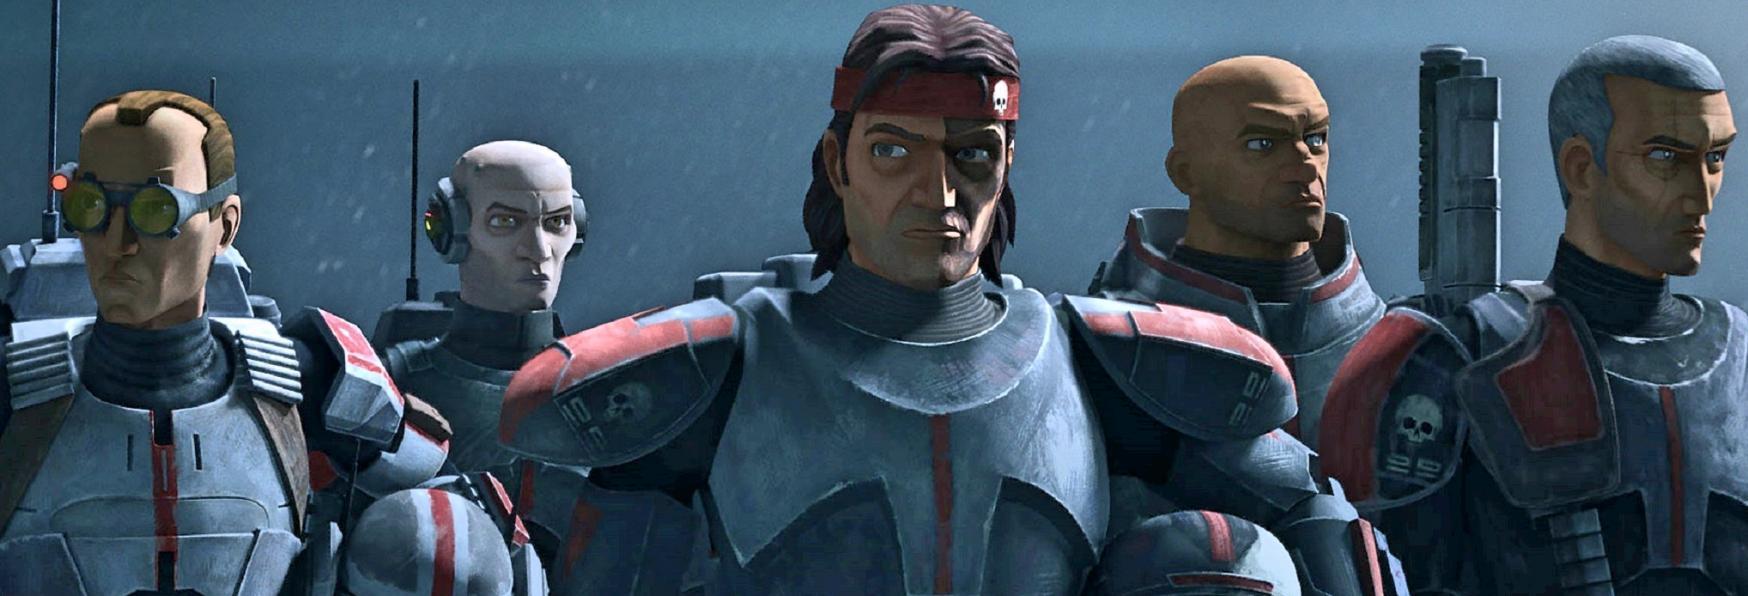 Star Wars: The Bad Batch 2 ci sarà! Rinnovata la Serie Disney